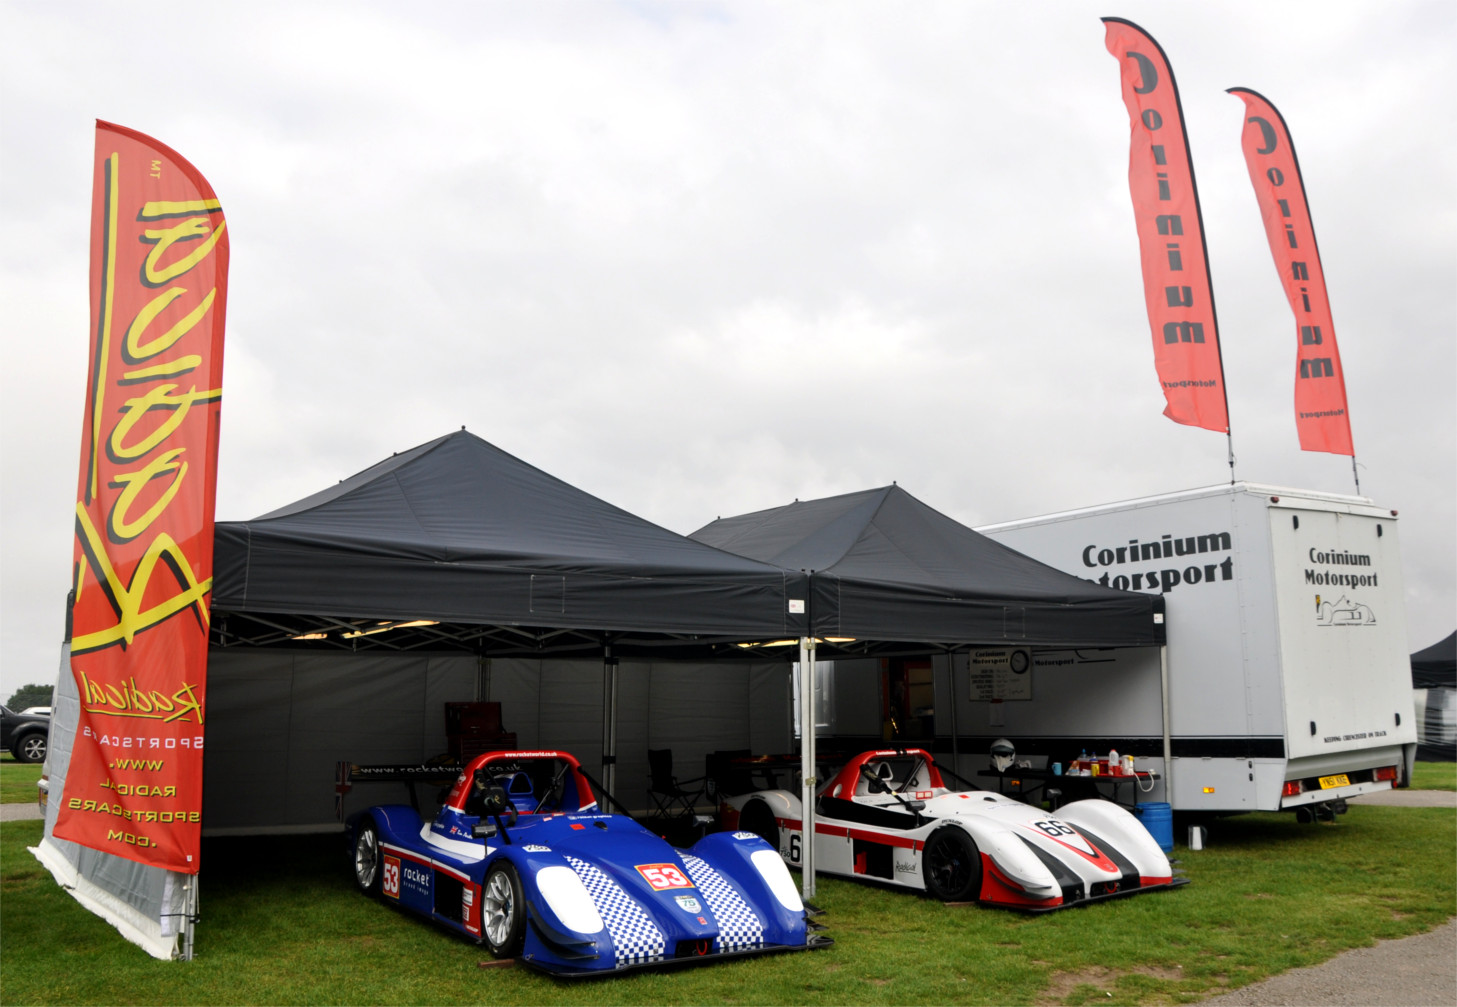 Corinium Motorsport - Cadwell Park - Radical Sportscars